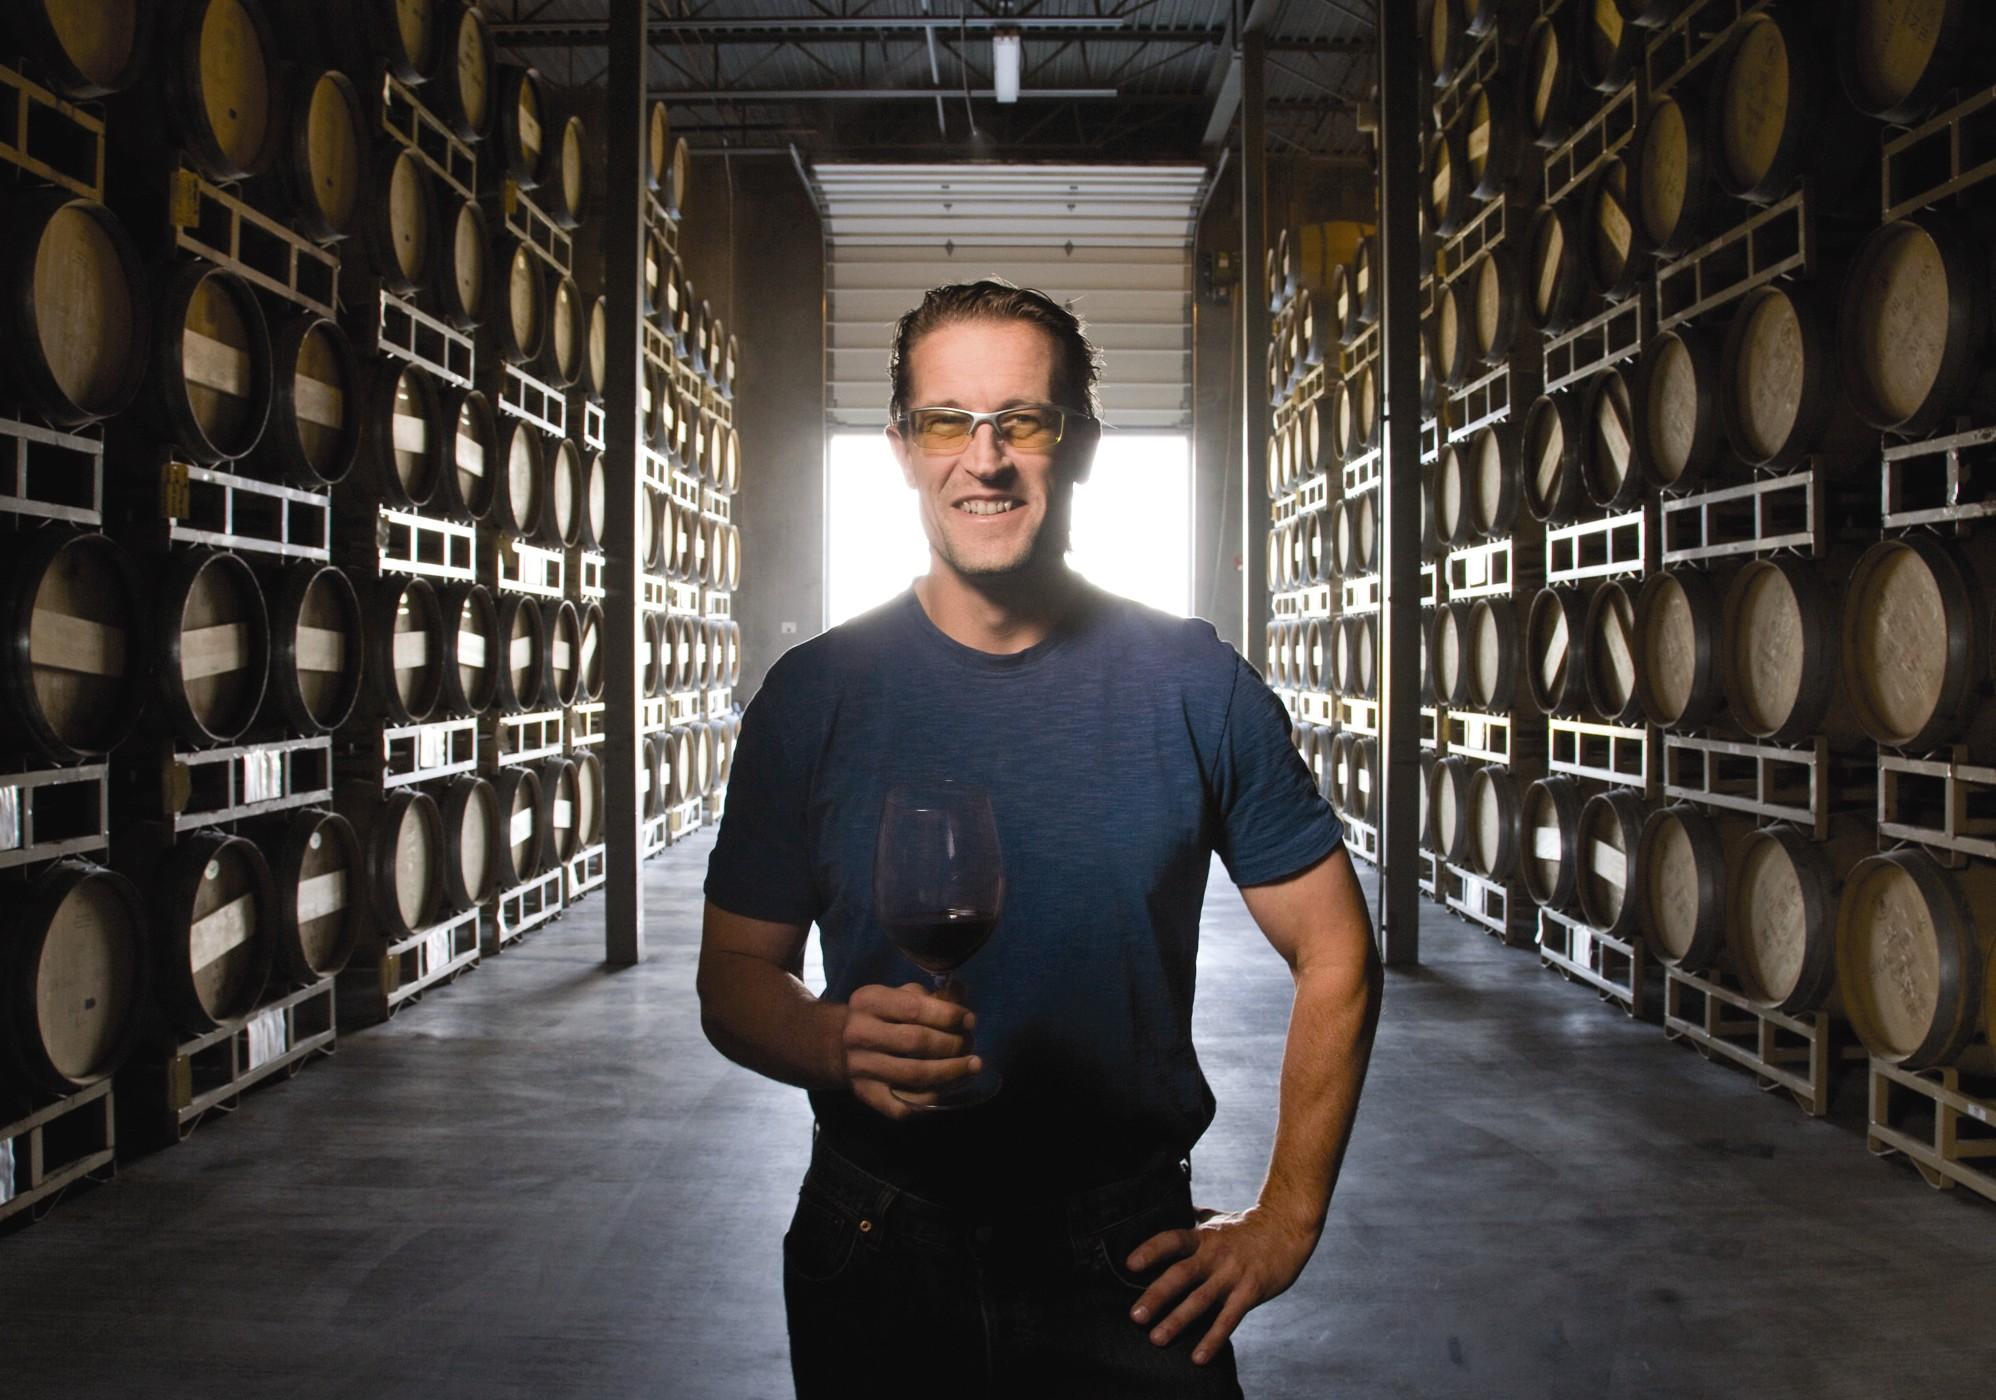 Legendary Northstar winemaker, David 'Merf' Merfeld, crafts some good everyday wines for MERF Wines.